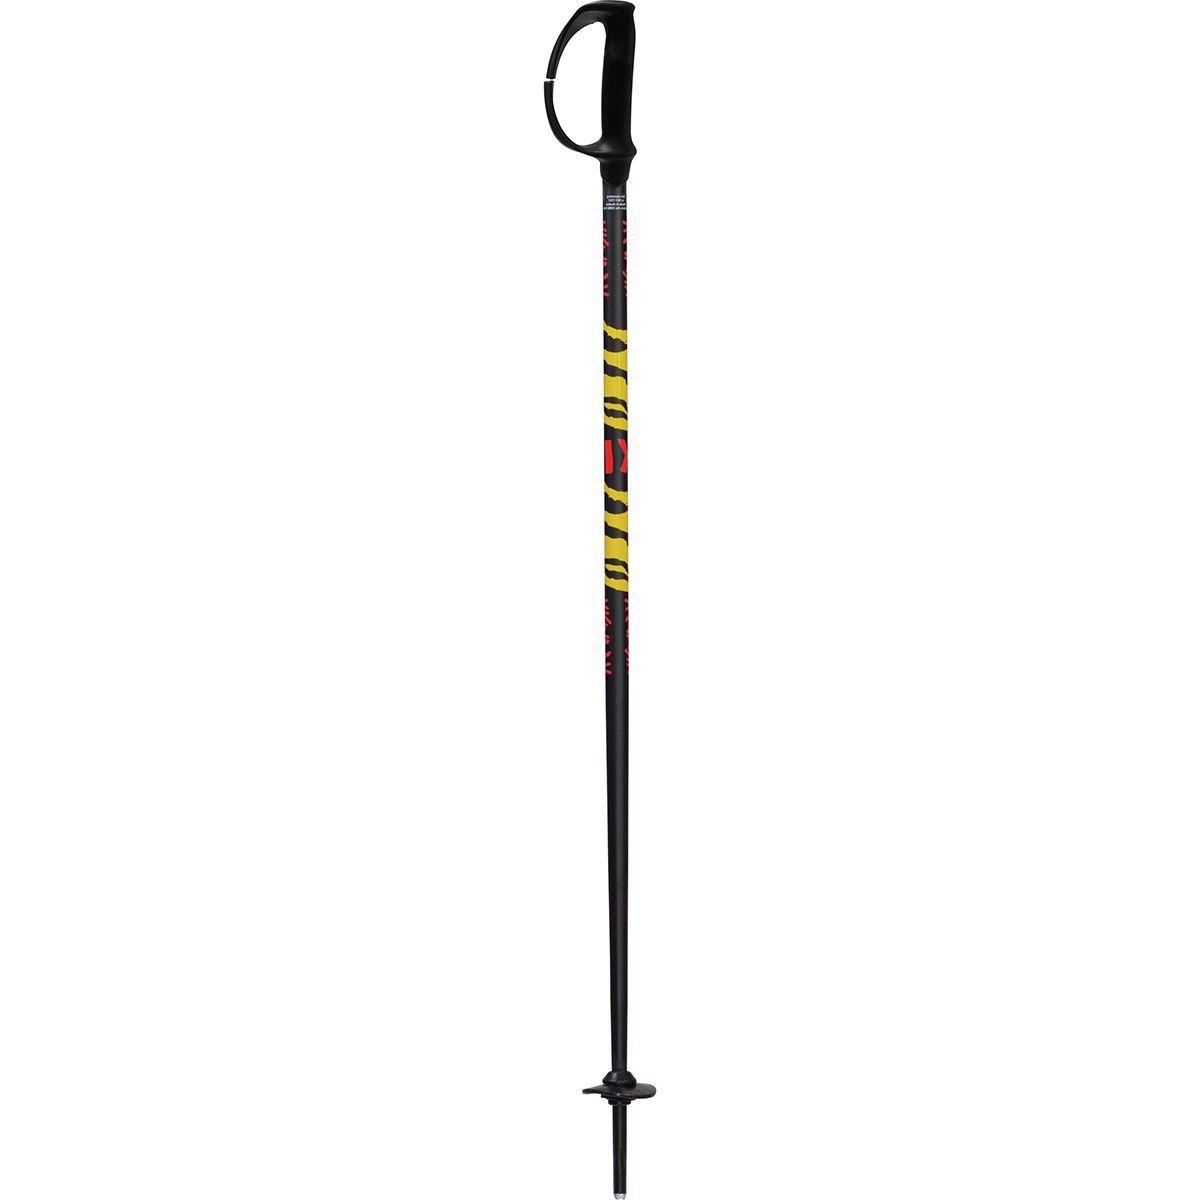 Armada Triad Ski Poles - Women's